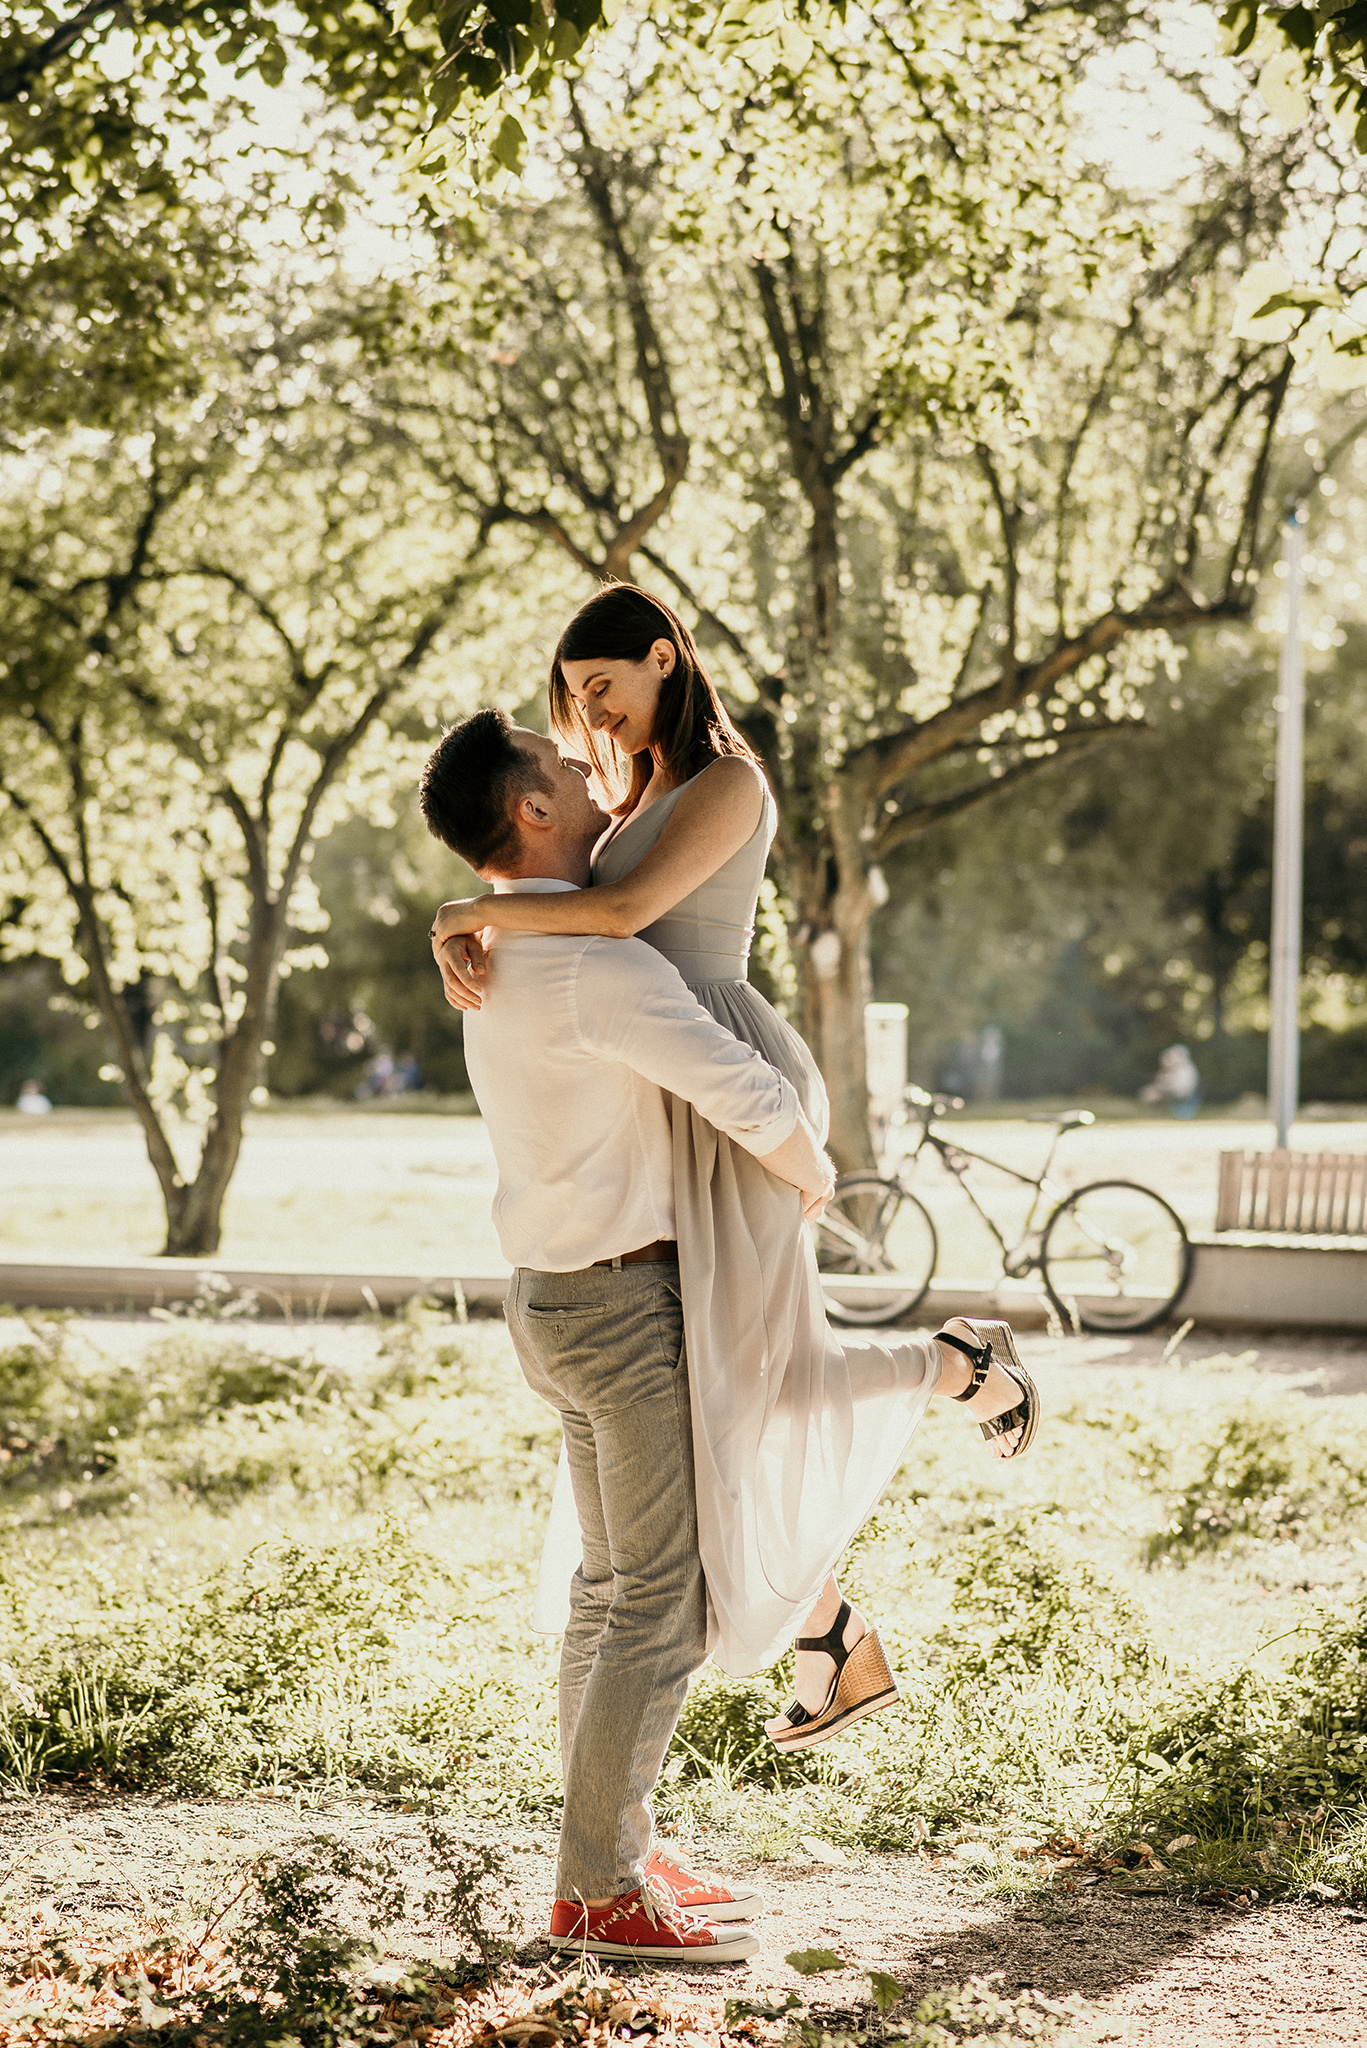 fotograf sesja pary w parku